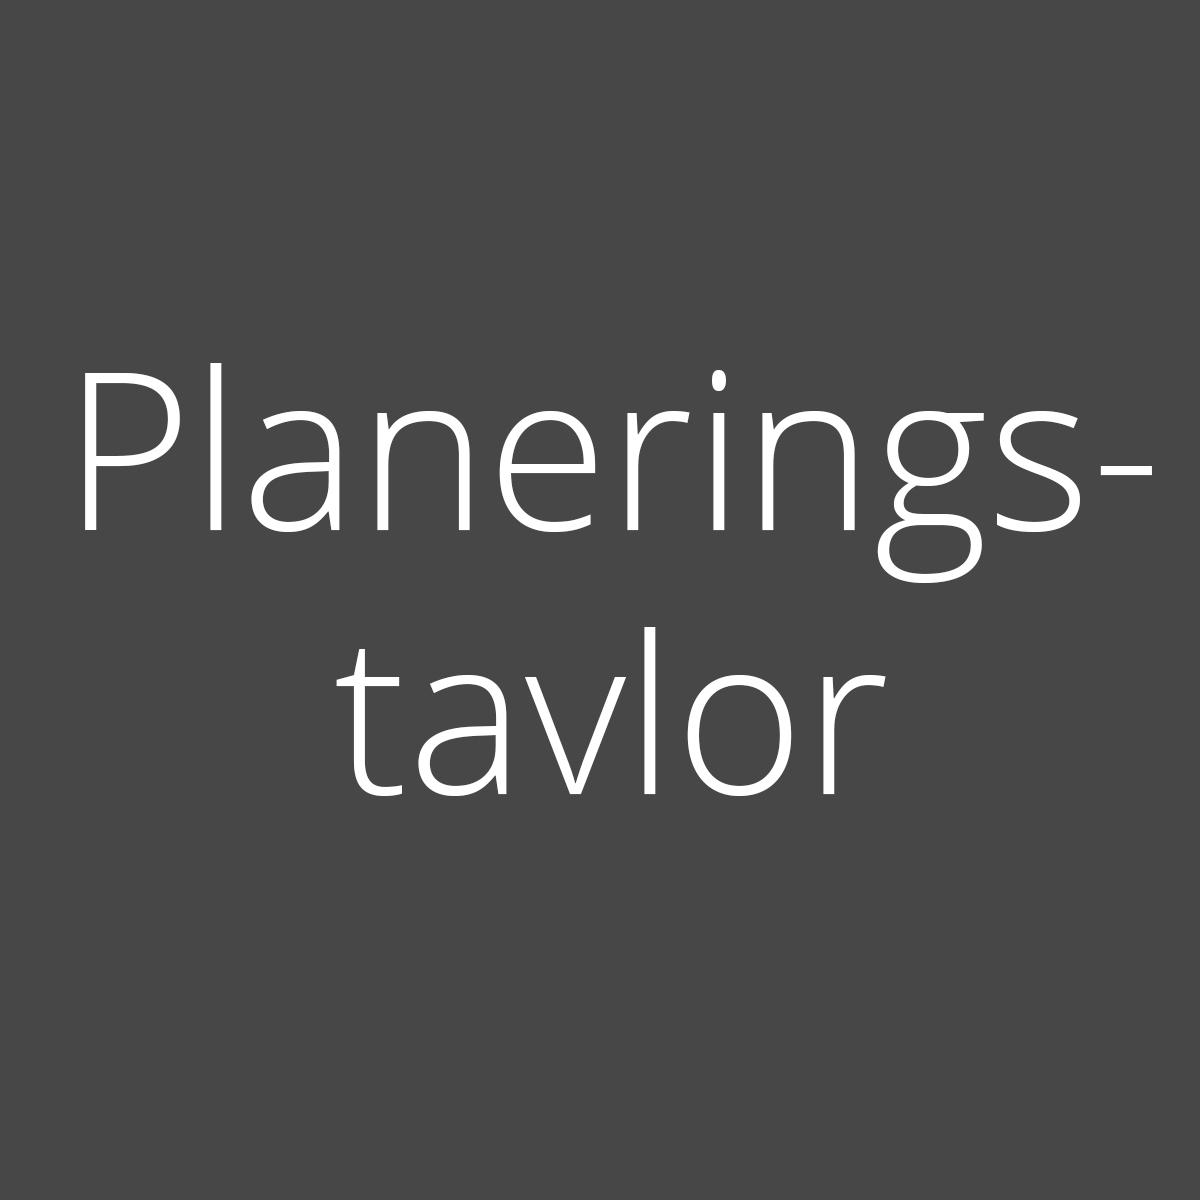 Planeringstavlor